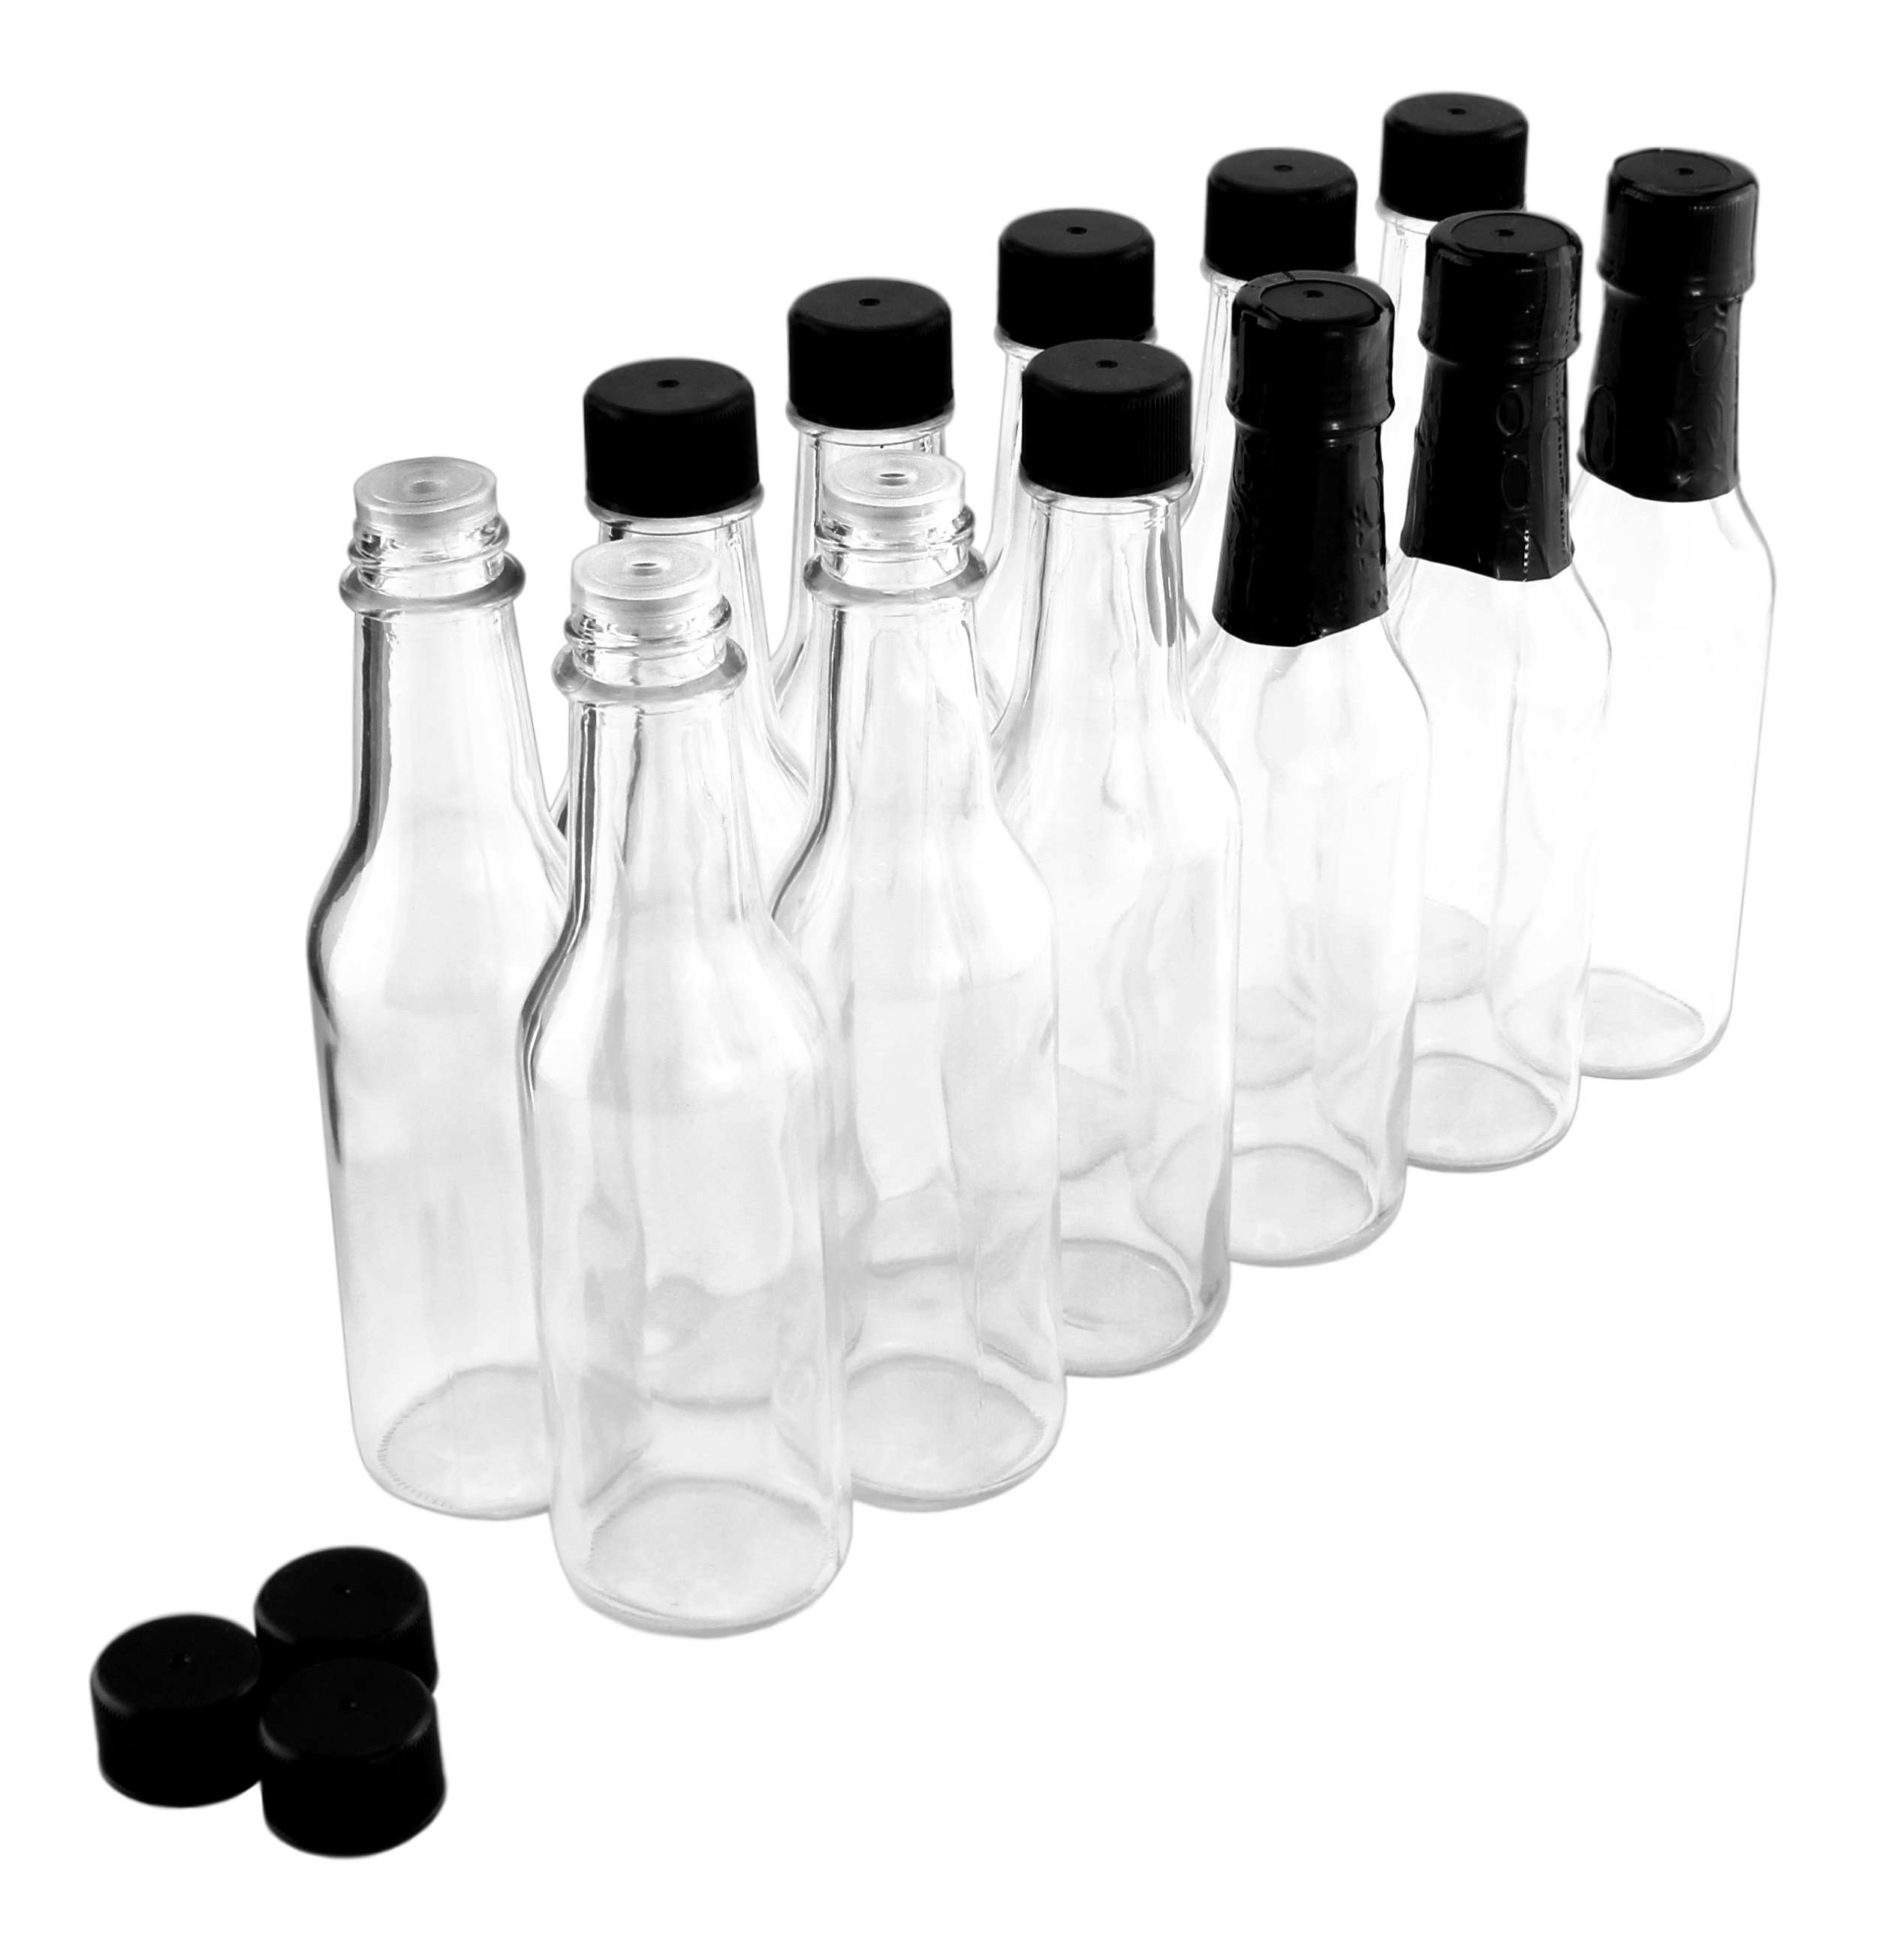 B016LPPR4Q - 5oz Empty Hot Sauce Woozy Bottles (12 Complete Bottles) (2)